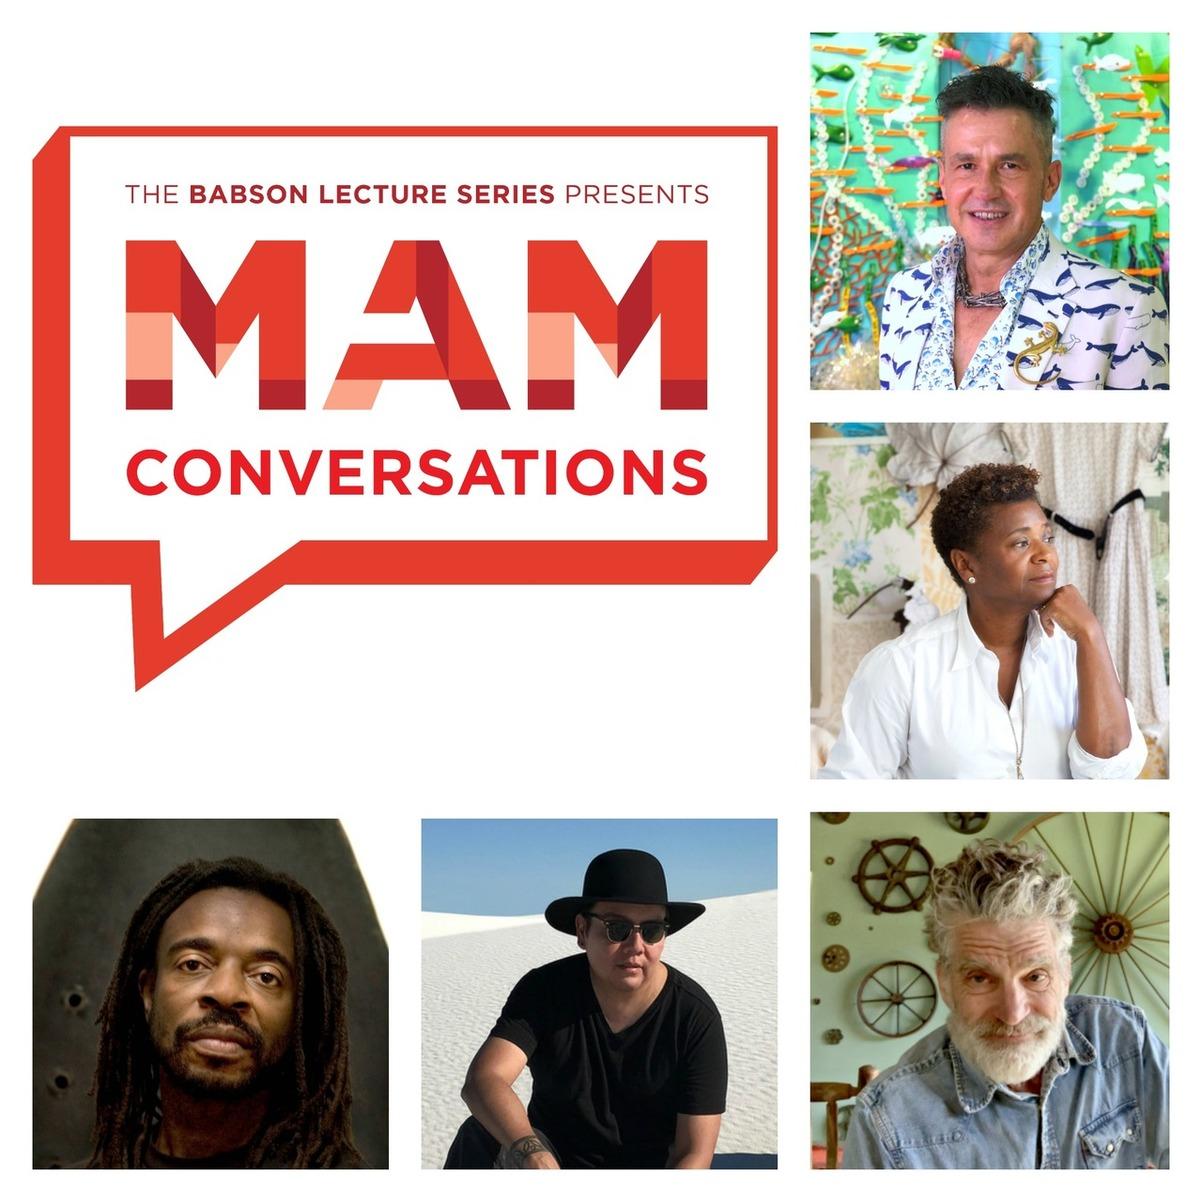 MAM Conversations series